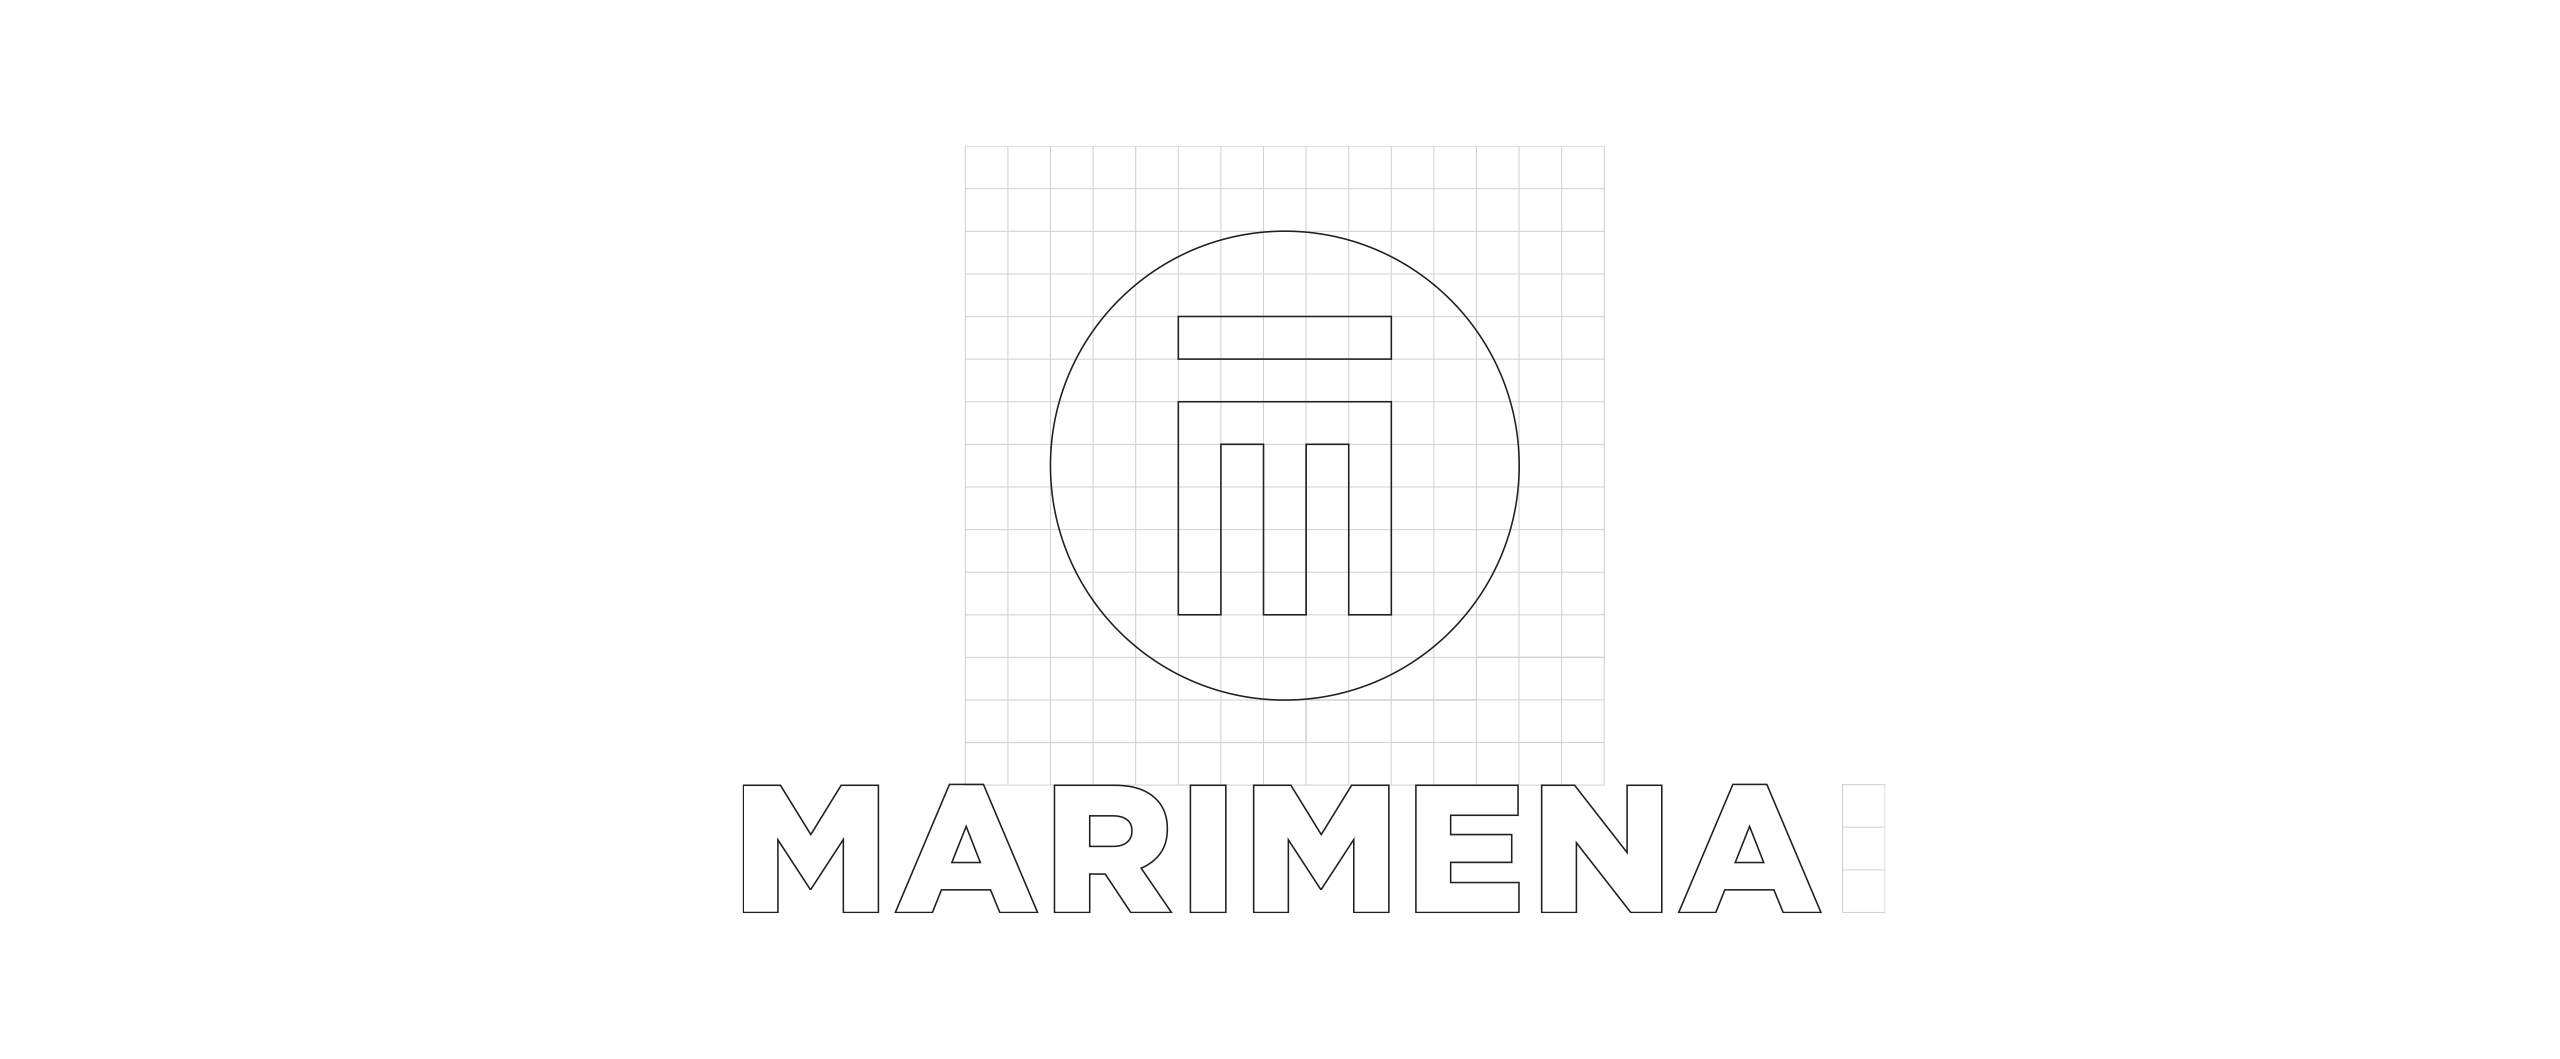 G-showcase_Marimena-Brand-Development-img02